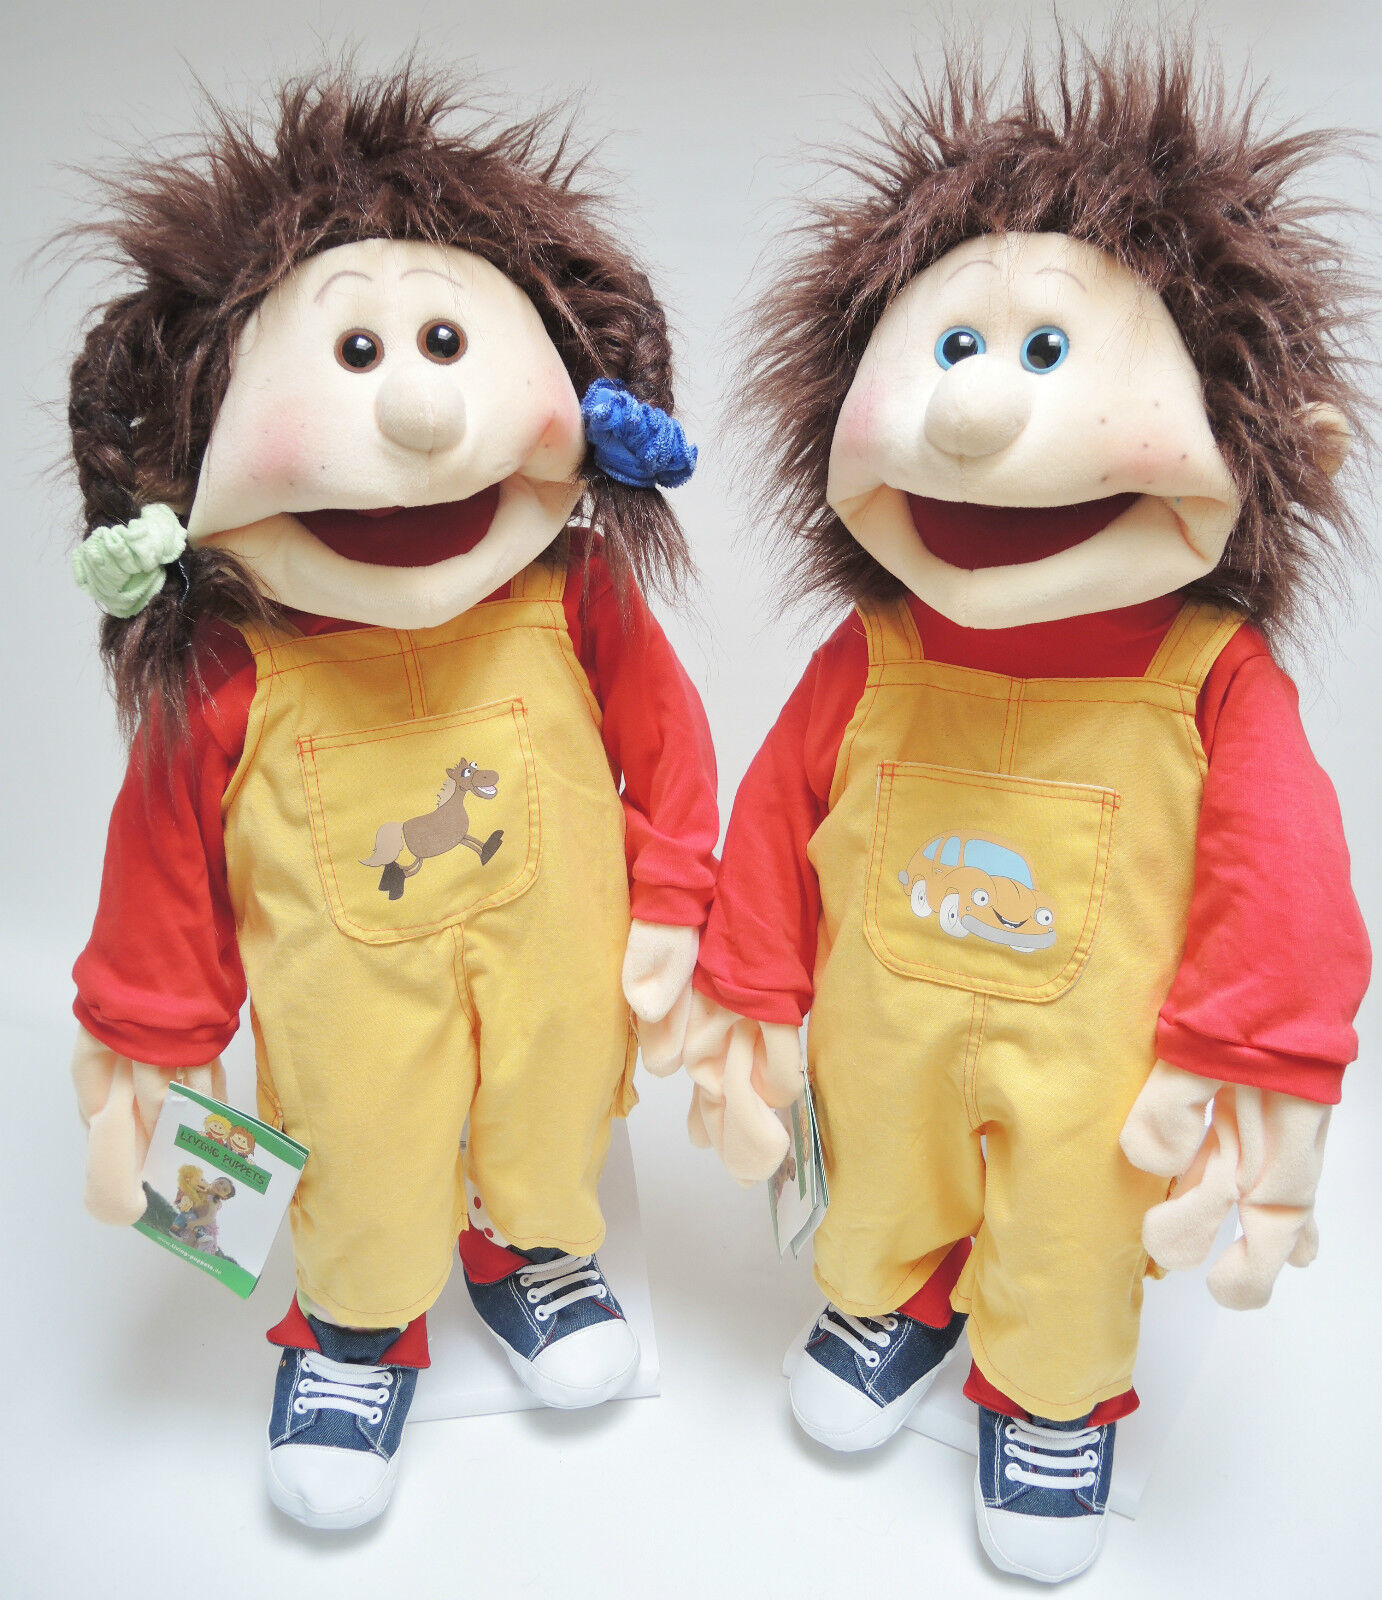 Living Puppets  Handpuppe Zwillinge Lou oder oder oder Ping zur Auswahl Gr.65cm   NEU 3bdf29